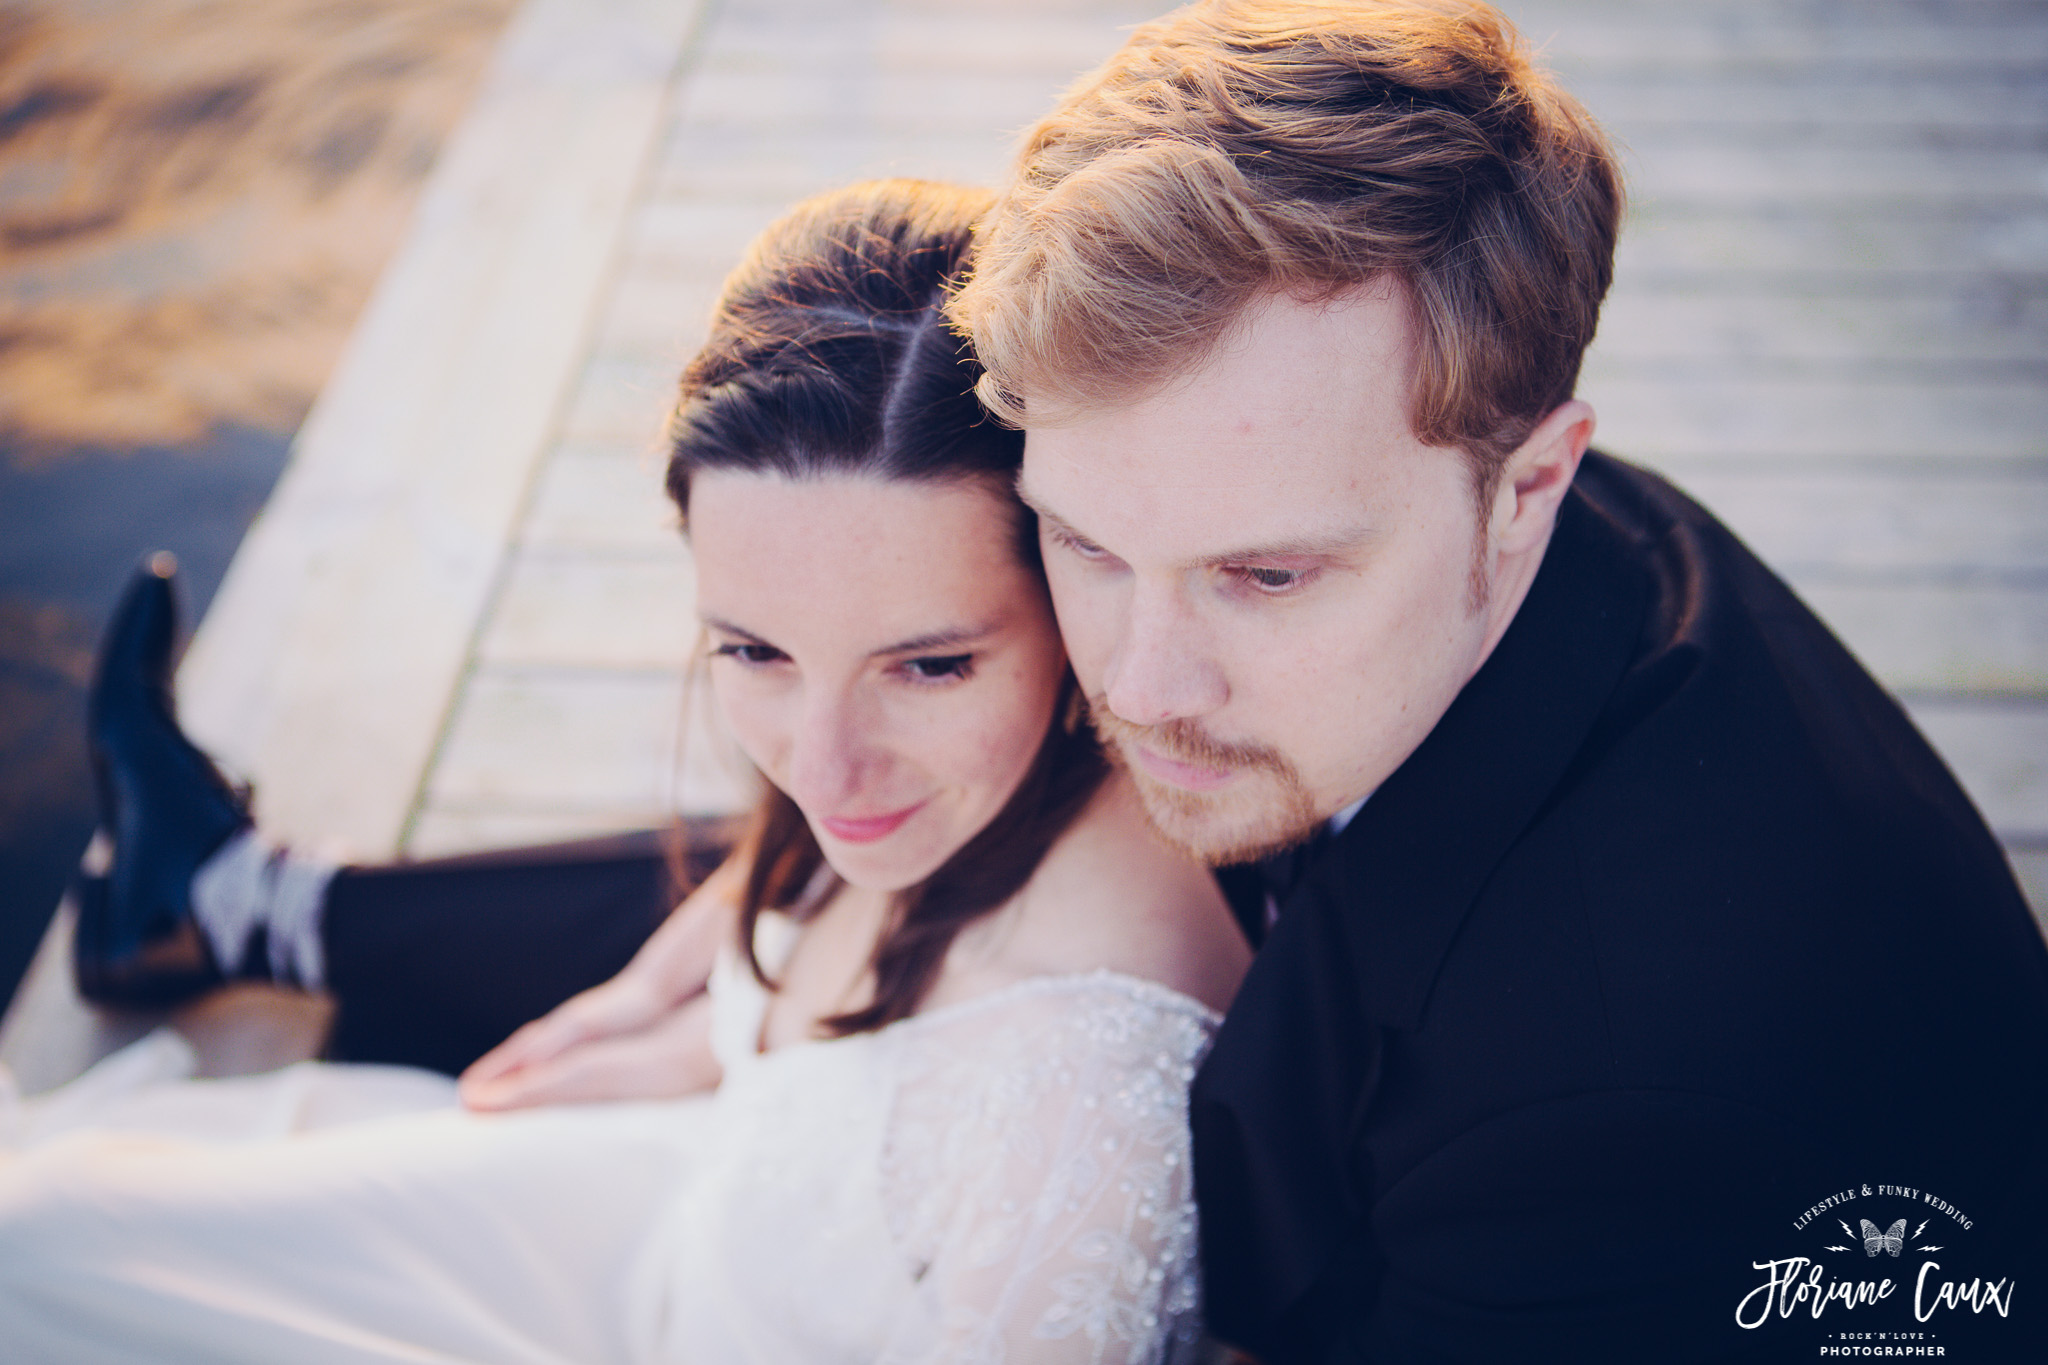 destination-wedding-photographer-oslo-norway-floriane-caux-43